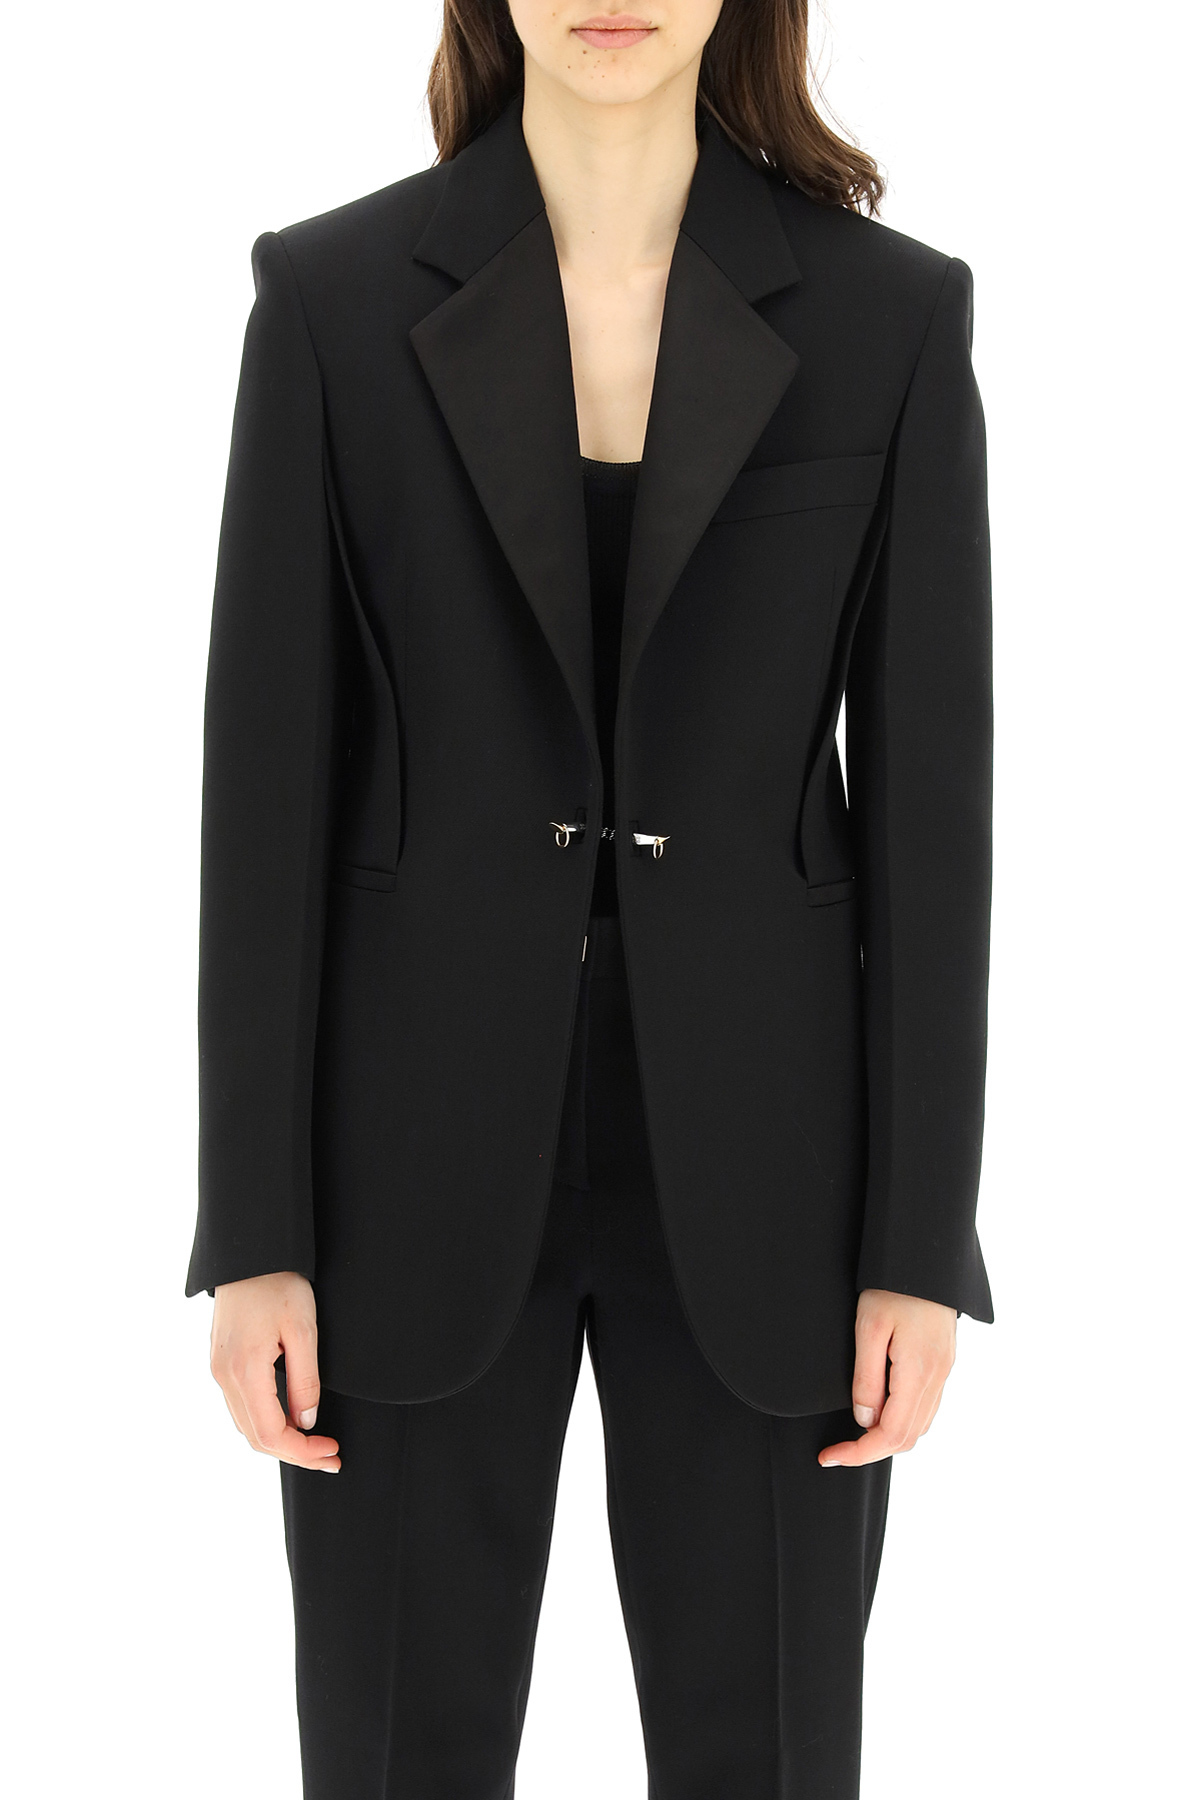 Givenchy blazer in lana